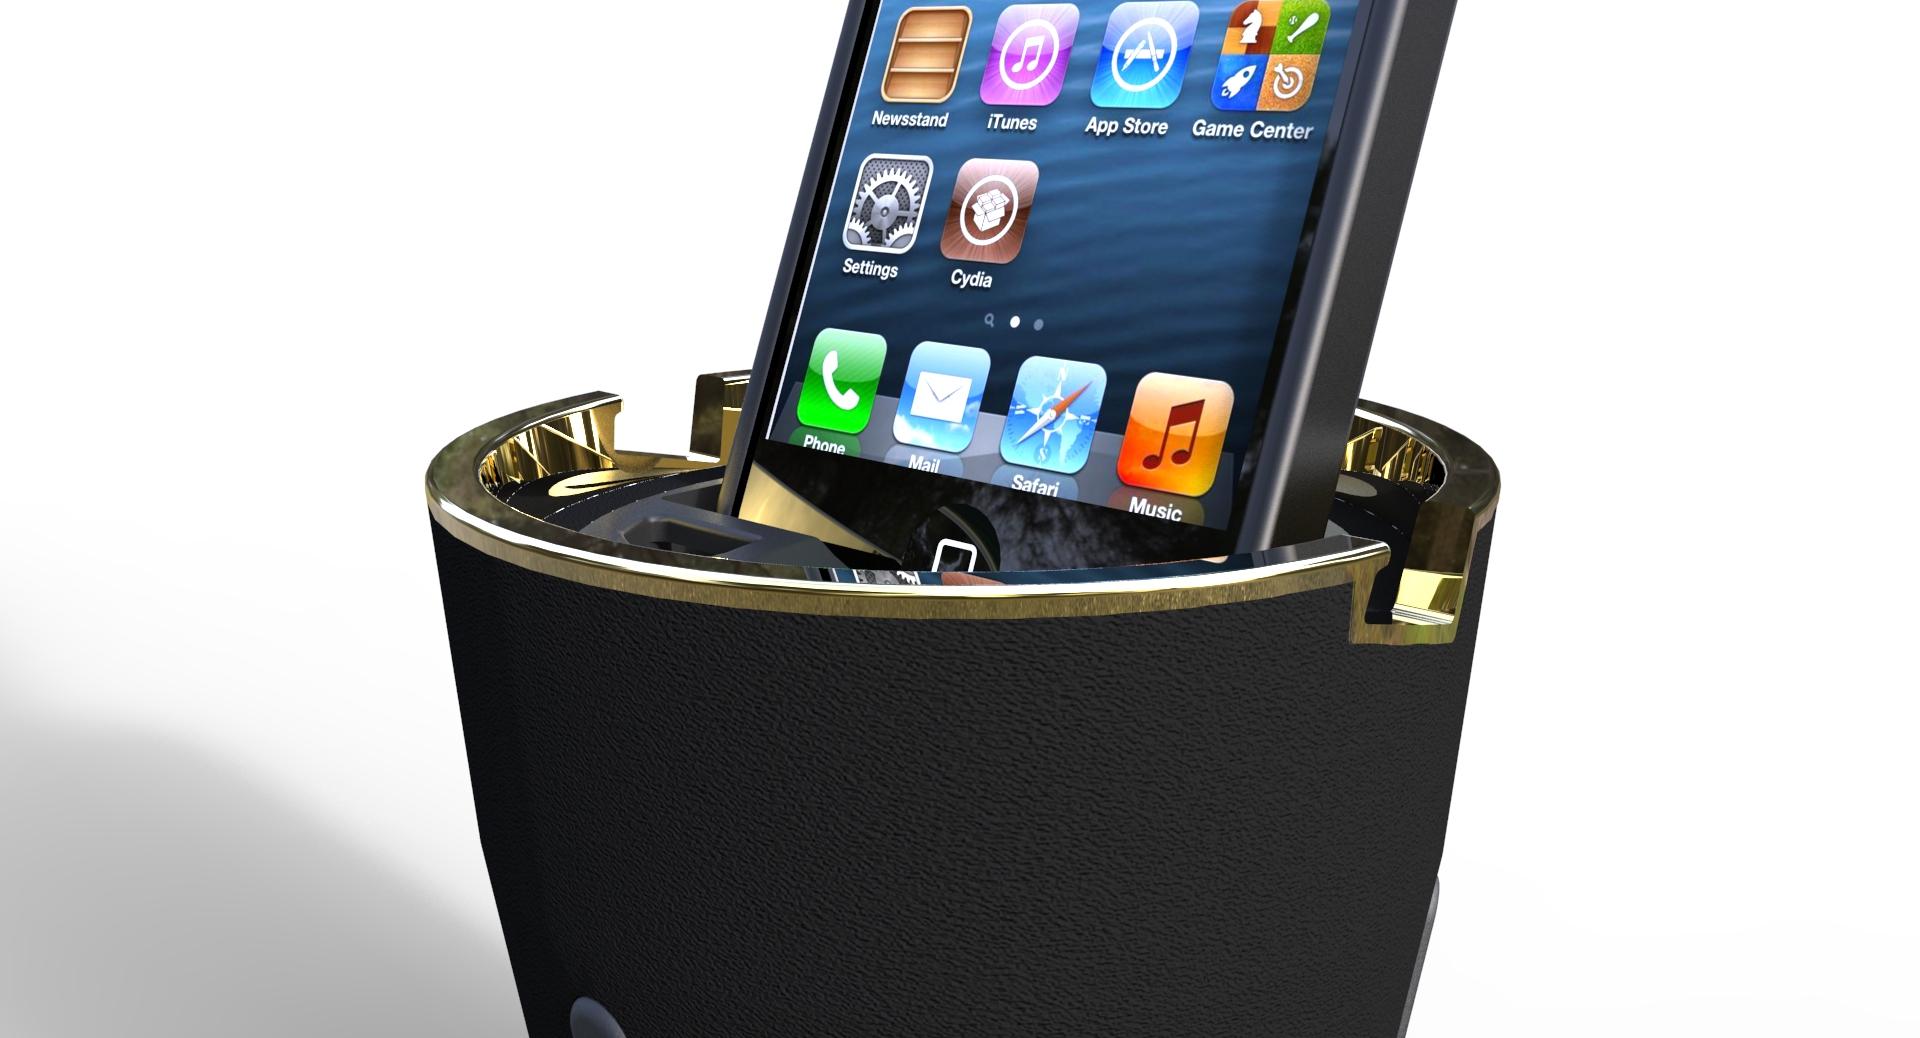 Hardware Manufacture Custom Car Docks Adopts Apple S New